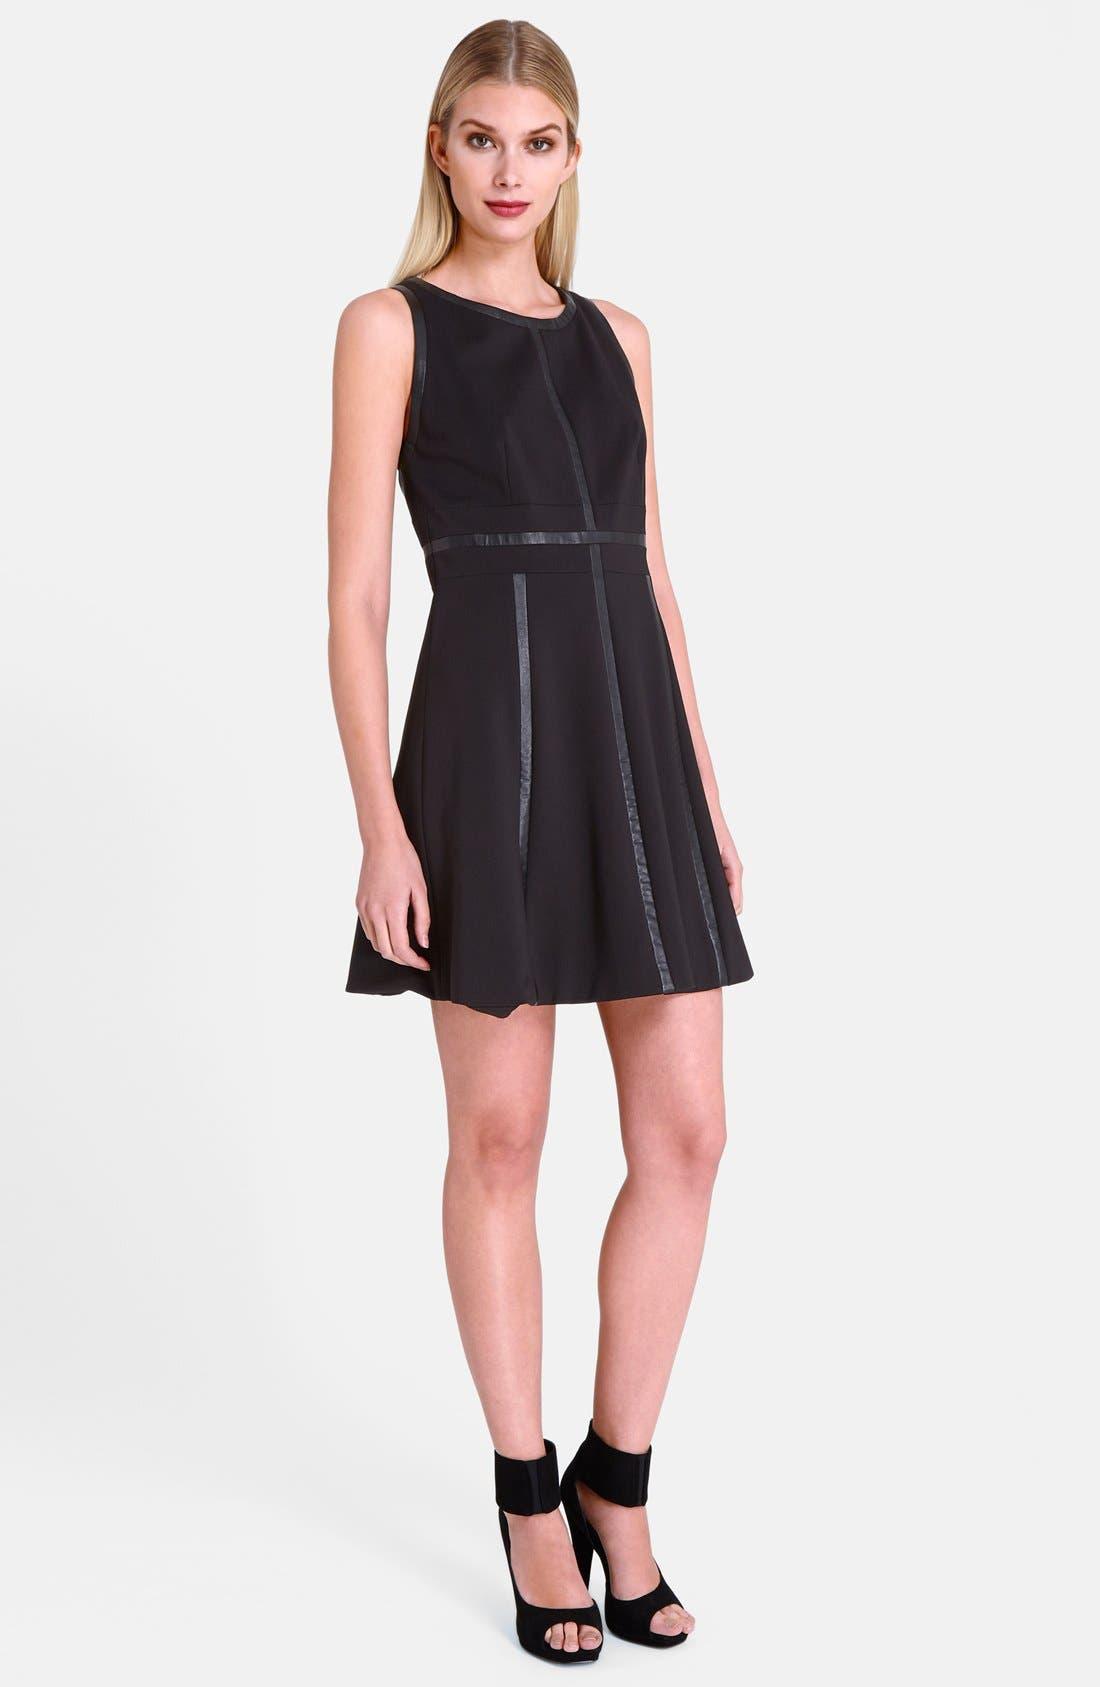 Main Image - Catherine Catherine Malandrino 'Lori' Faux Leather Trim Dress